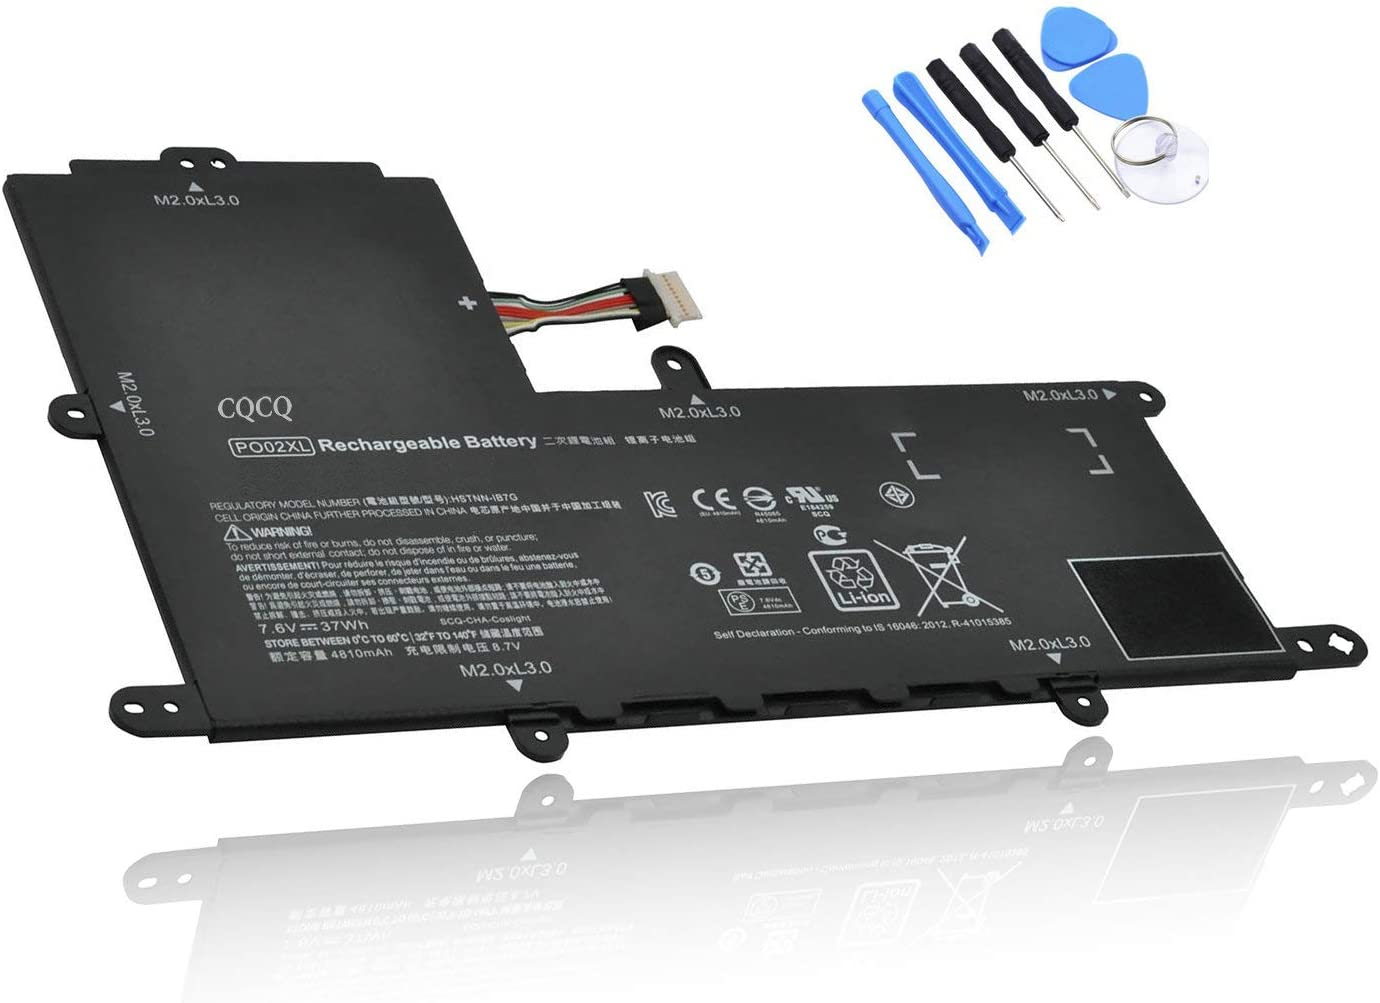 CQCQ PO02XL Compatible Battery Replacement for HP Stream 11-R 11-R010NR 11-R014WM Series HSTNN-DB7G HSTNN-IB7G TPN-Q166 [7.6V 37Wh]